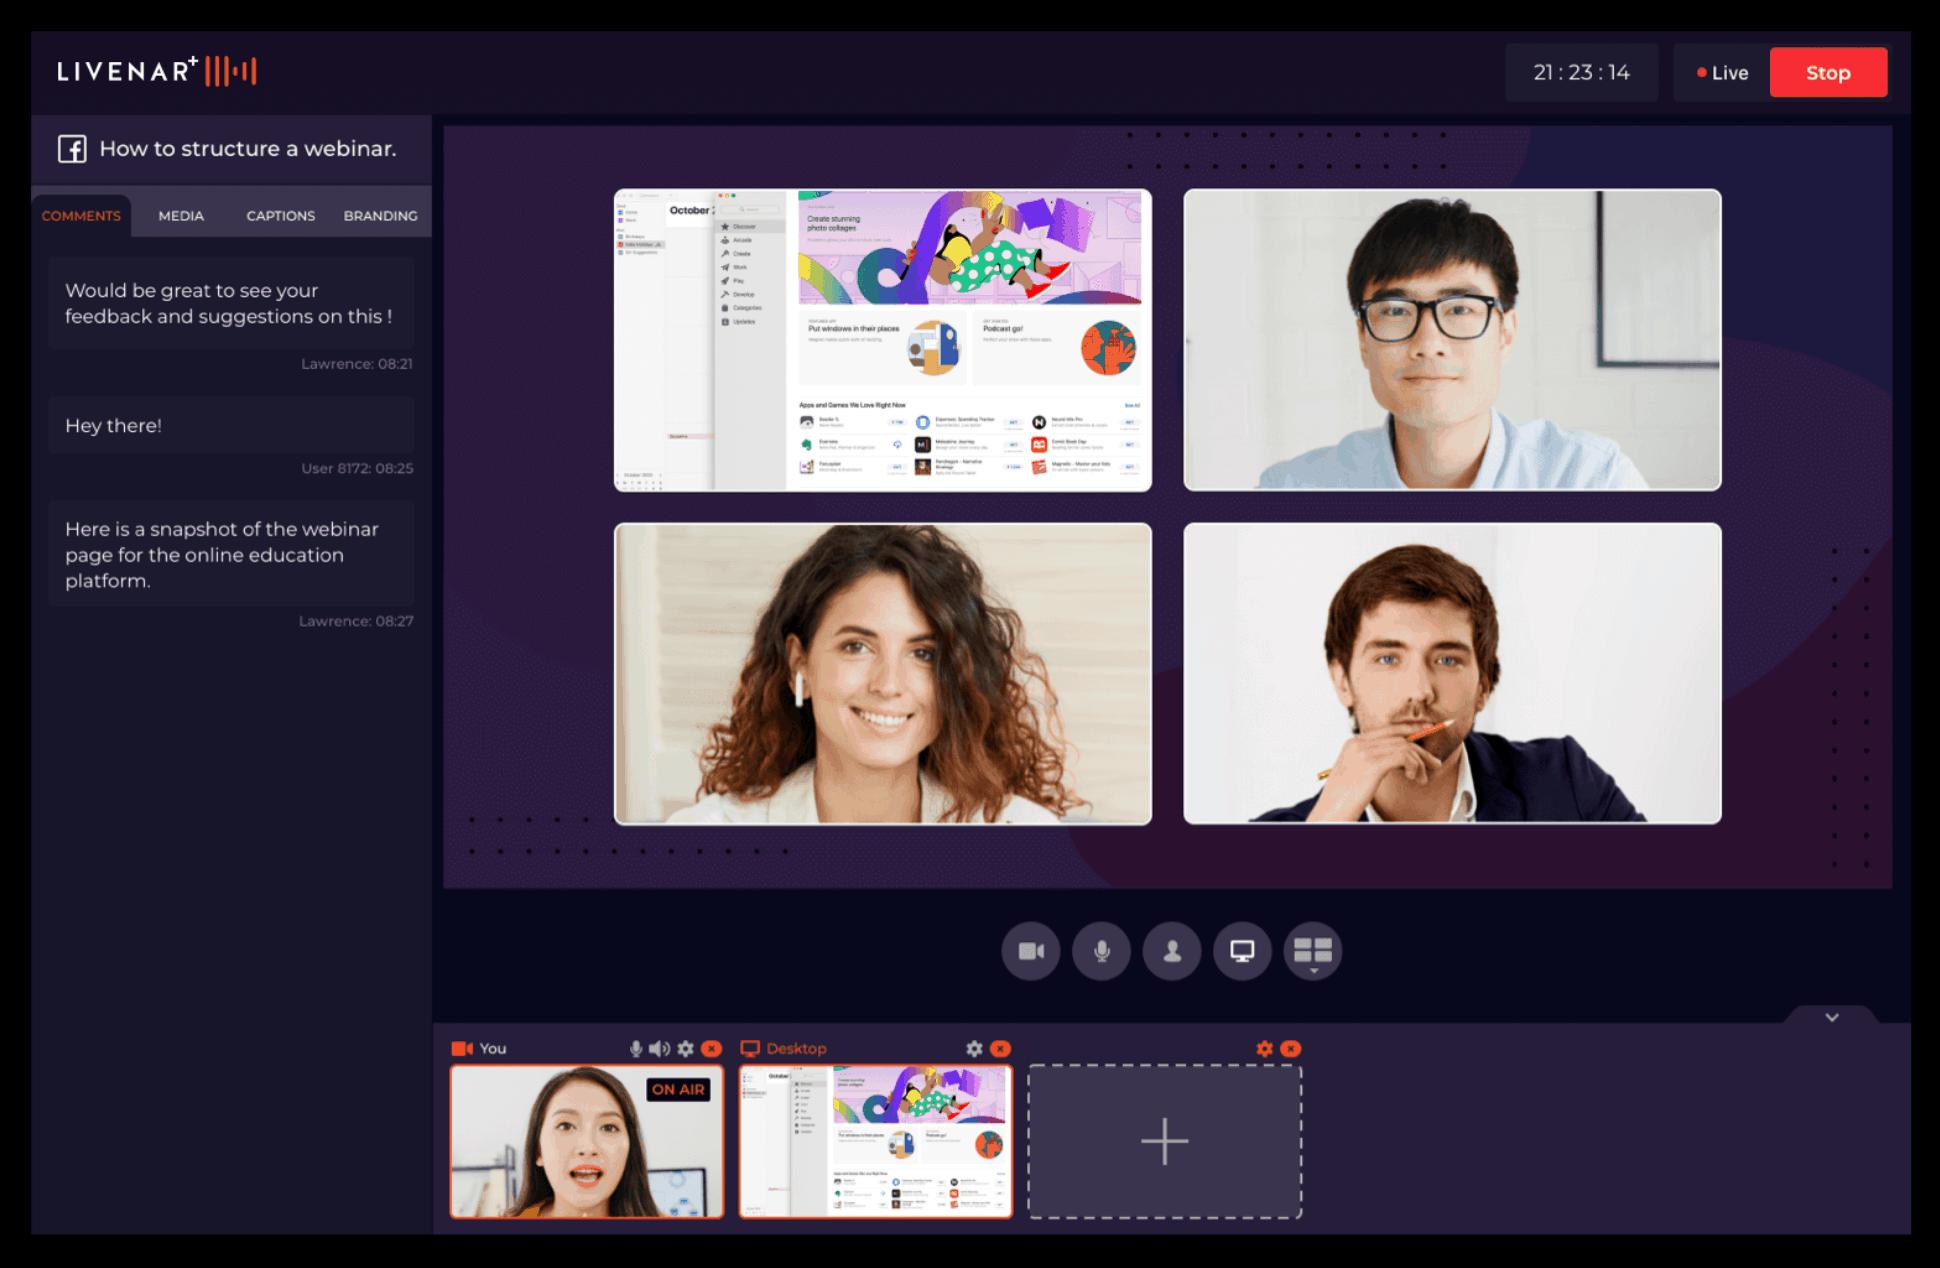 Livenar | Live Streaming platform 3